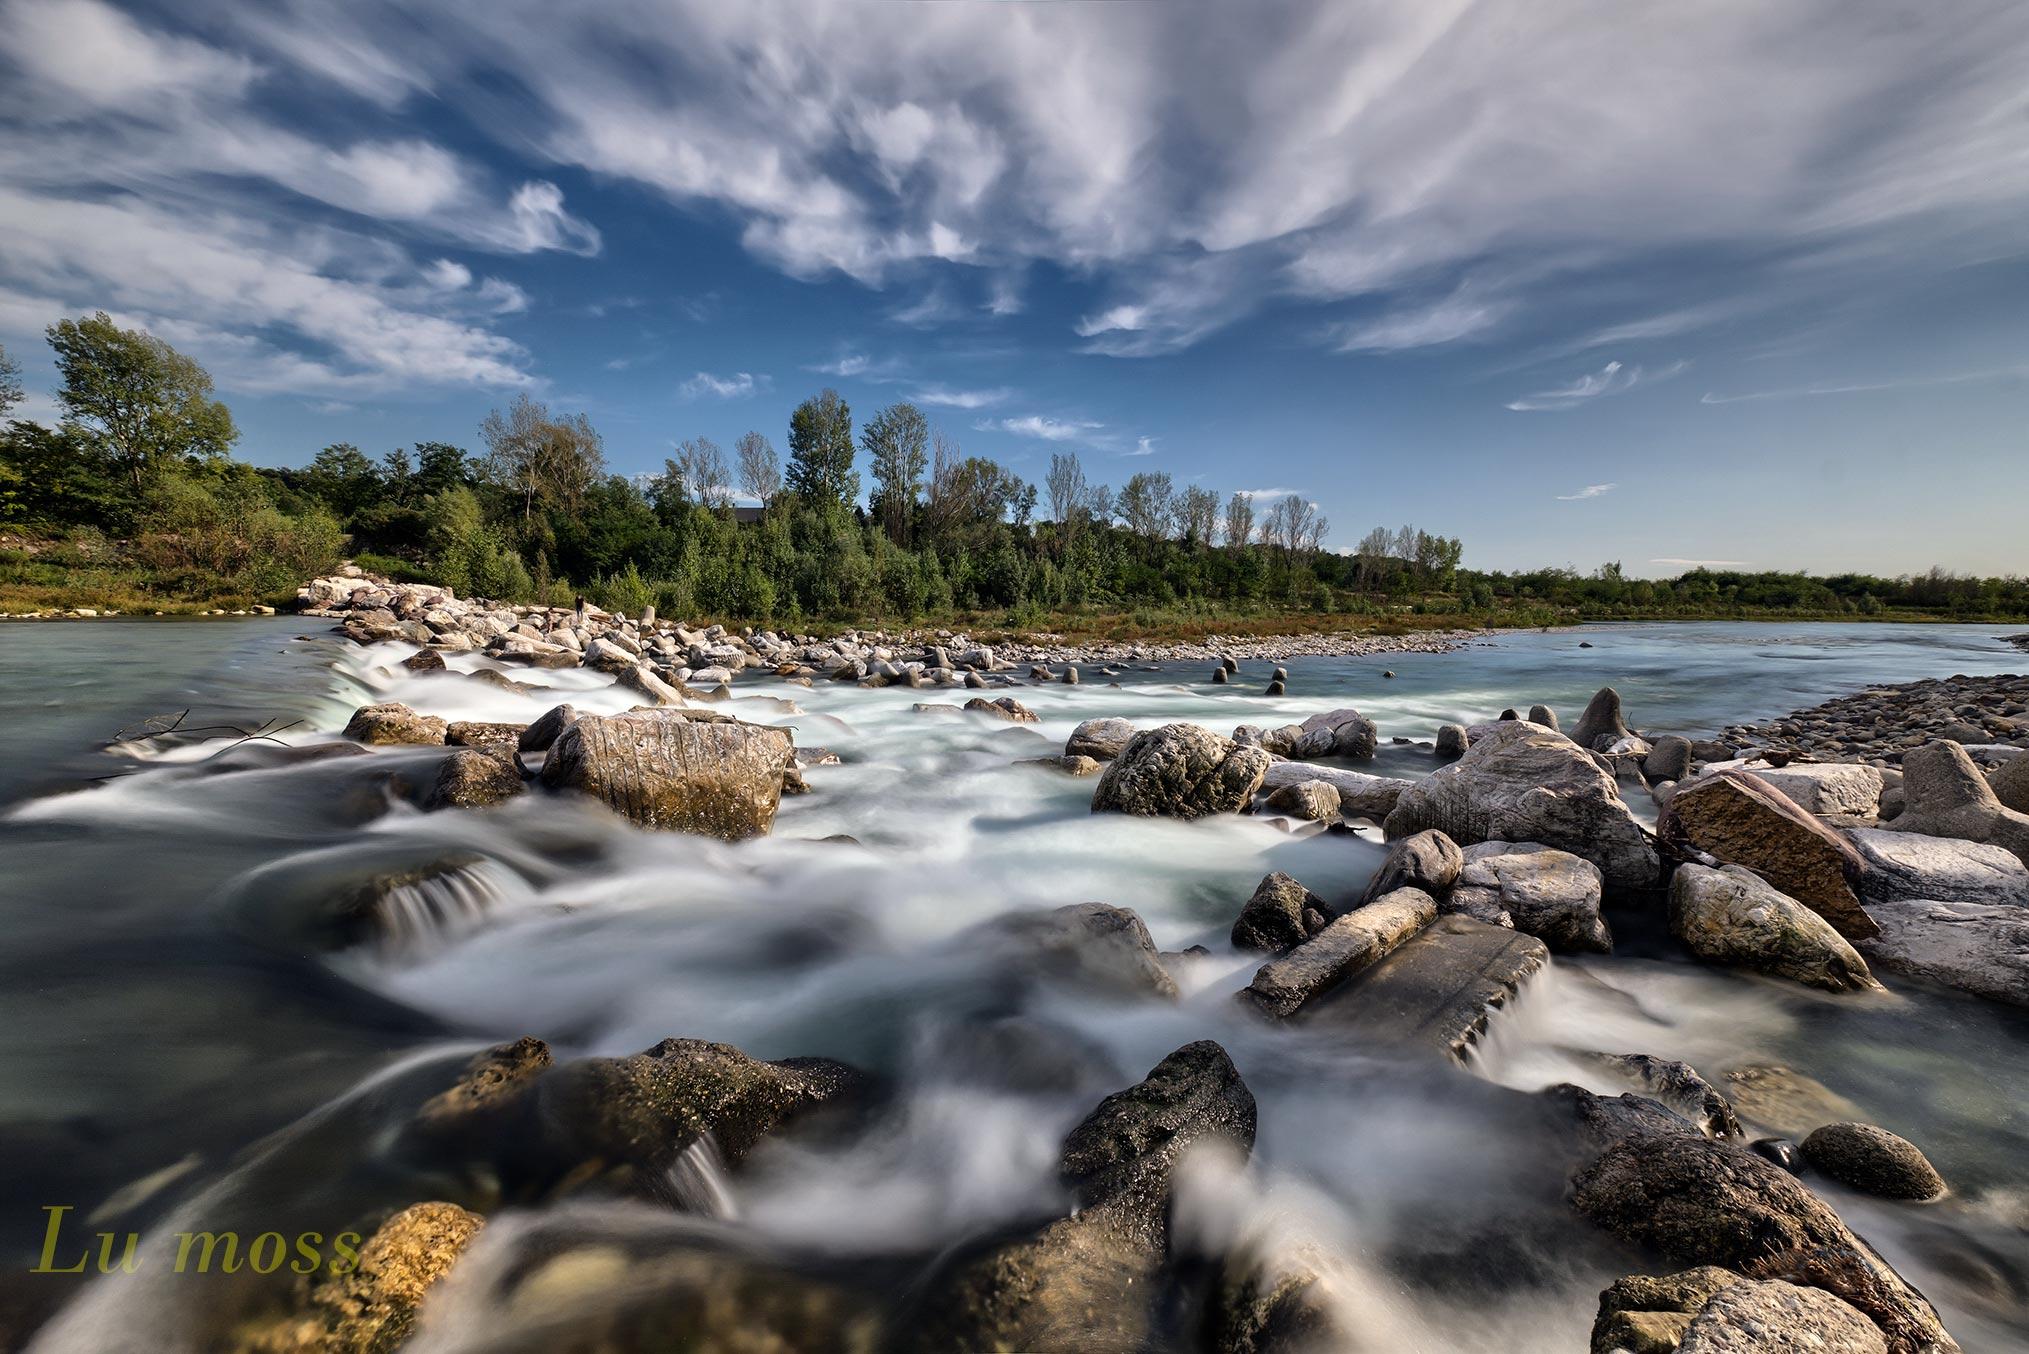 Brembo river rapids...